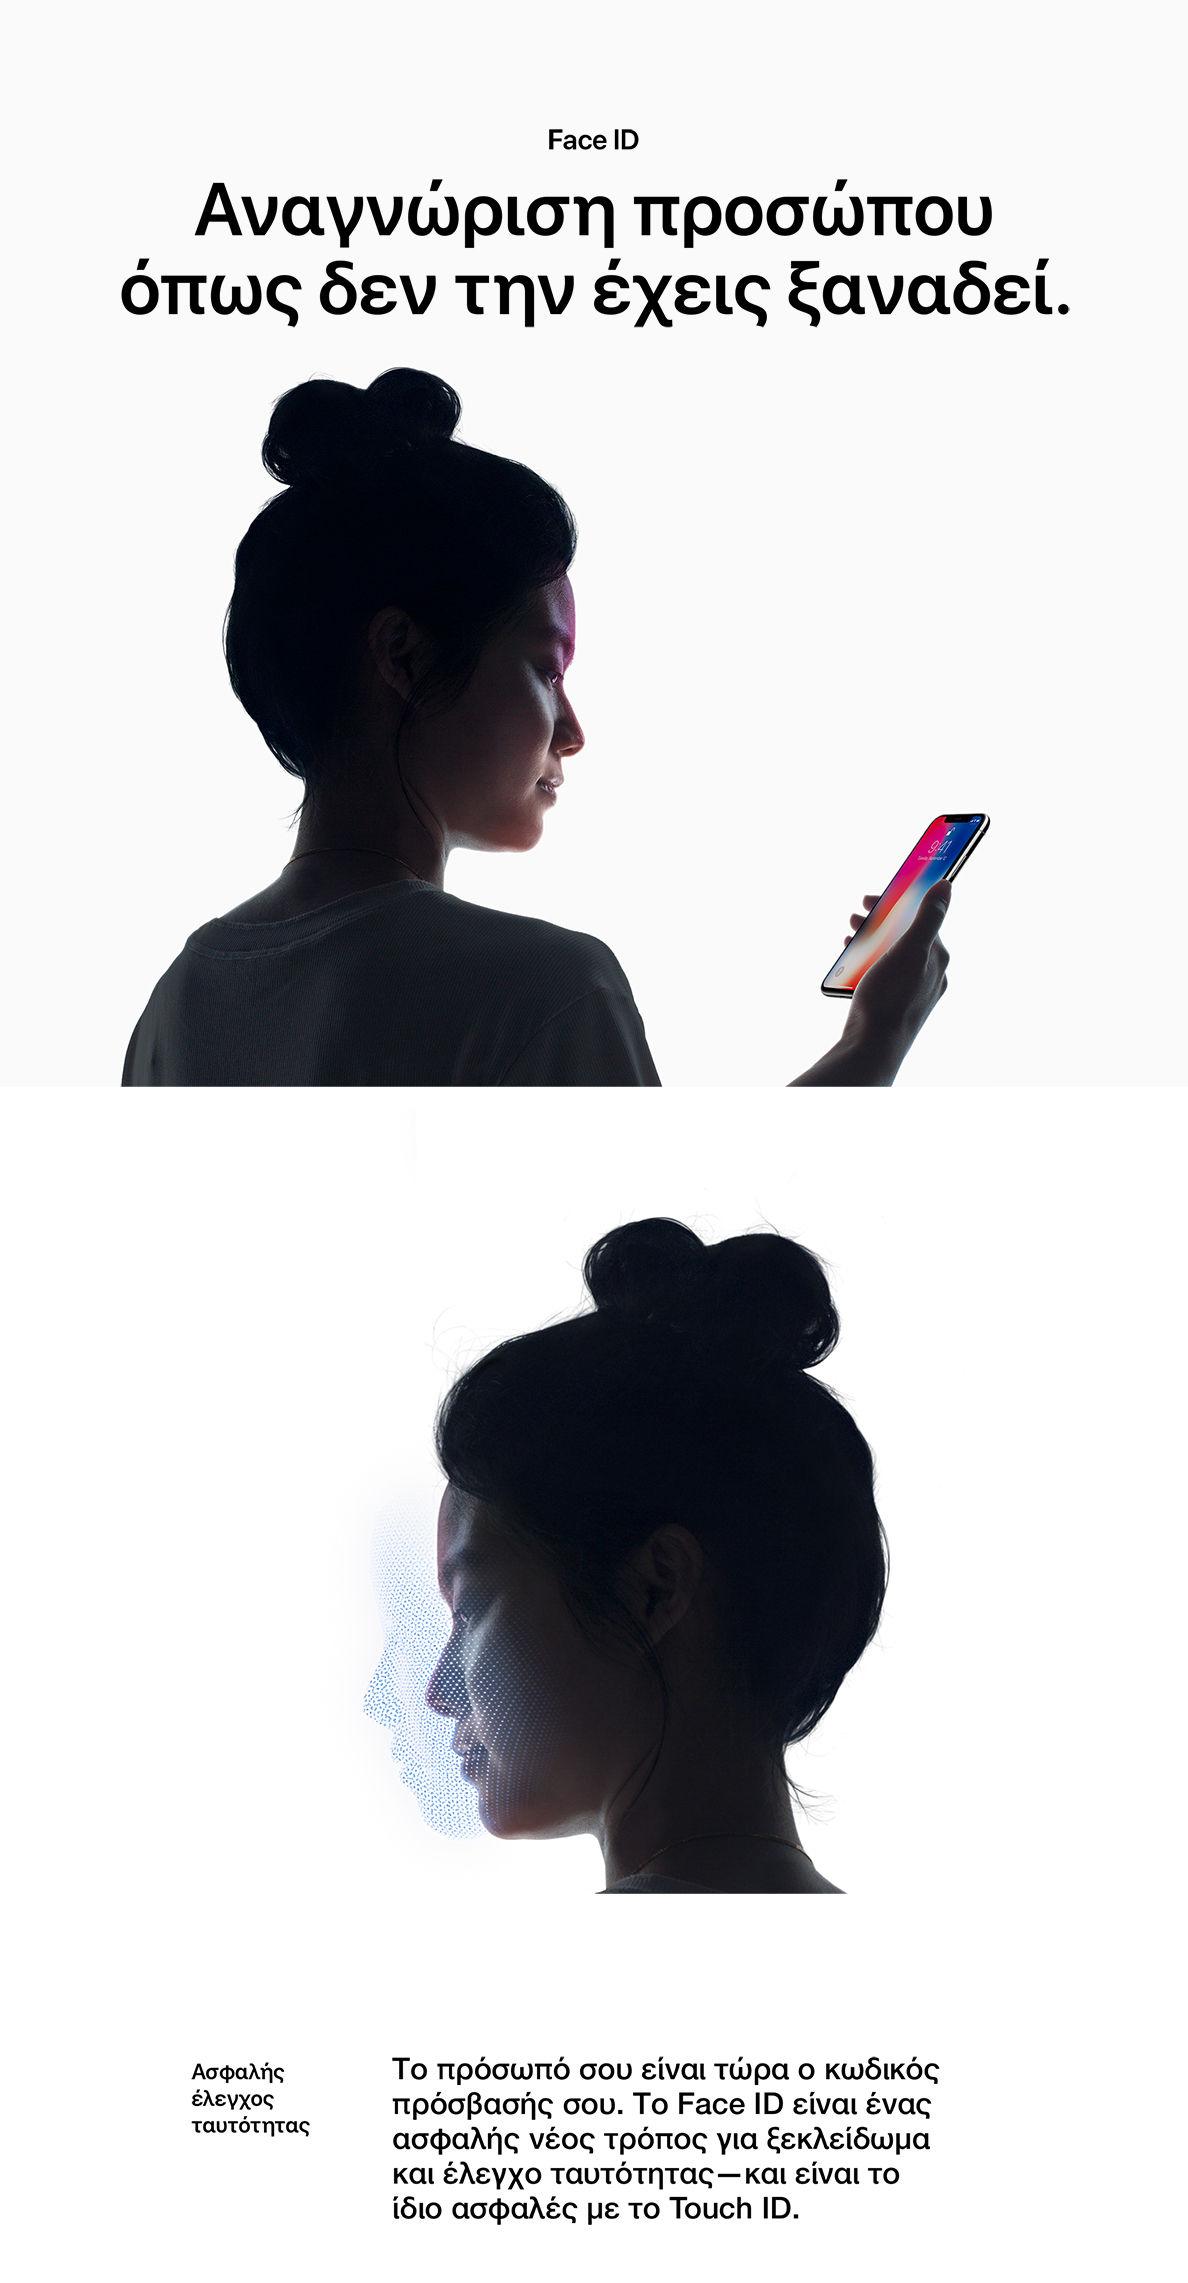 iPhonex-agora-Ellada-Mediamarkt-public-kotsovolos-germanos-iPhoneX-diathesimo-gia-paraggelia-november-2017 (5)